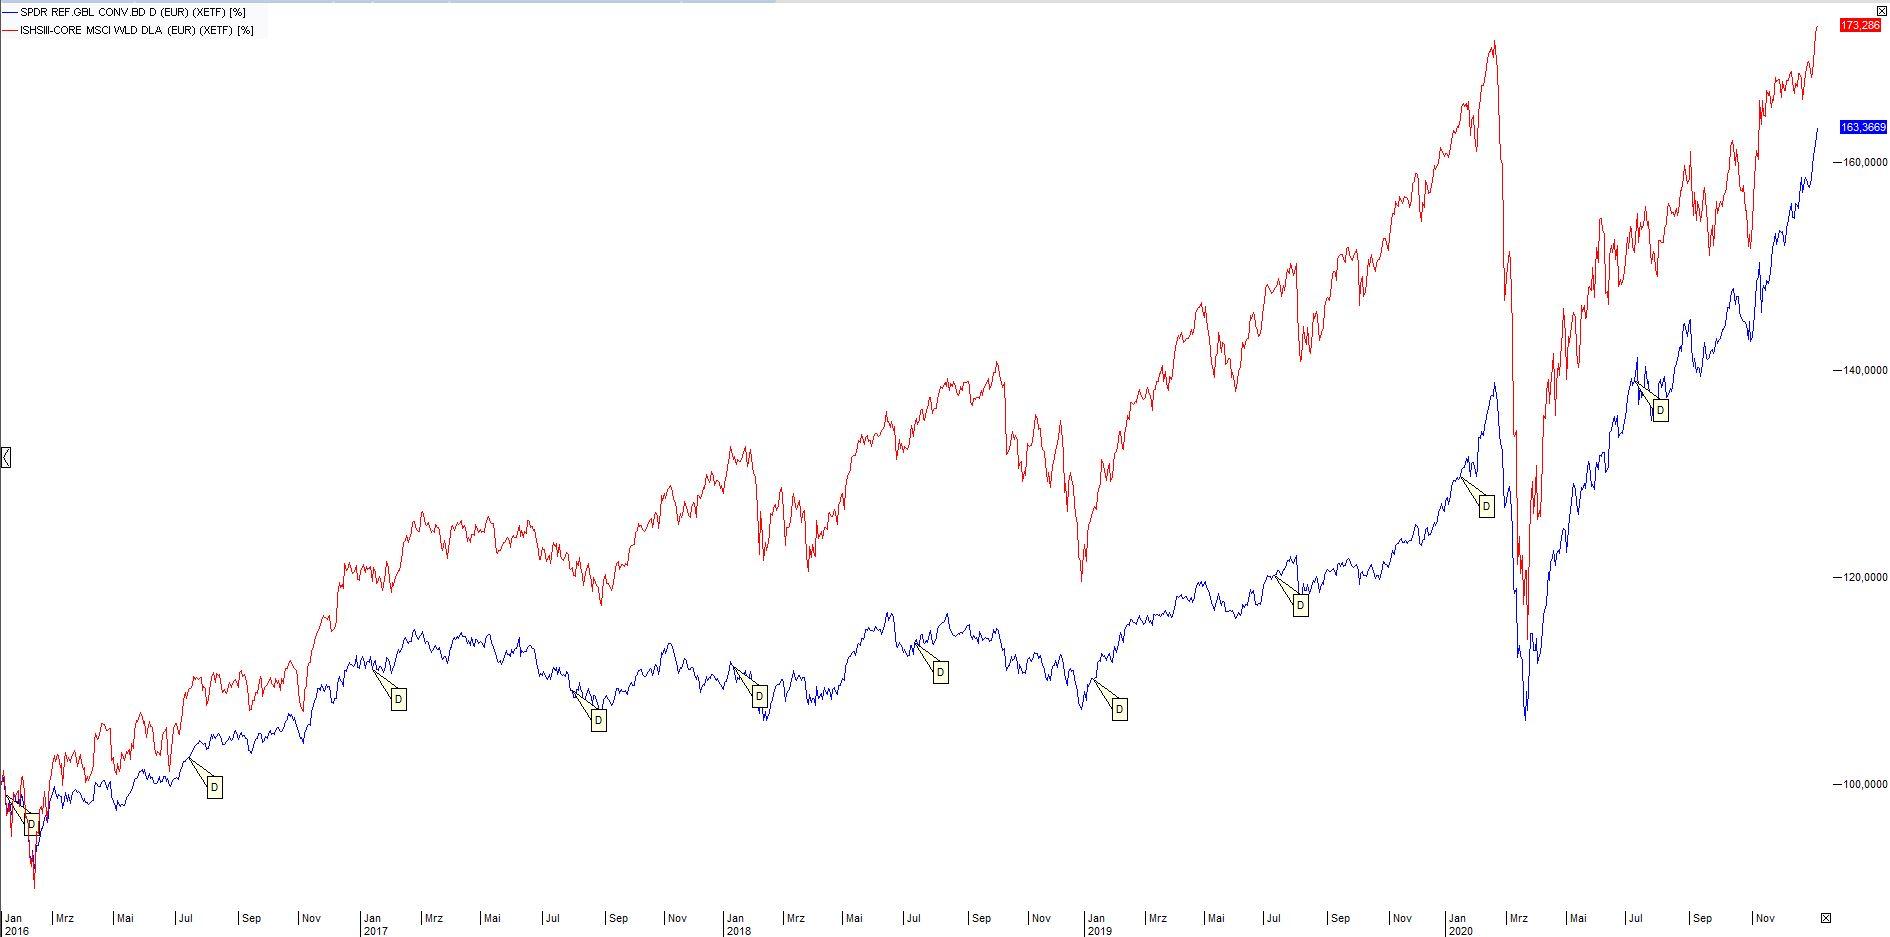 Wandelanleihen-Aktien-Zinsen